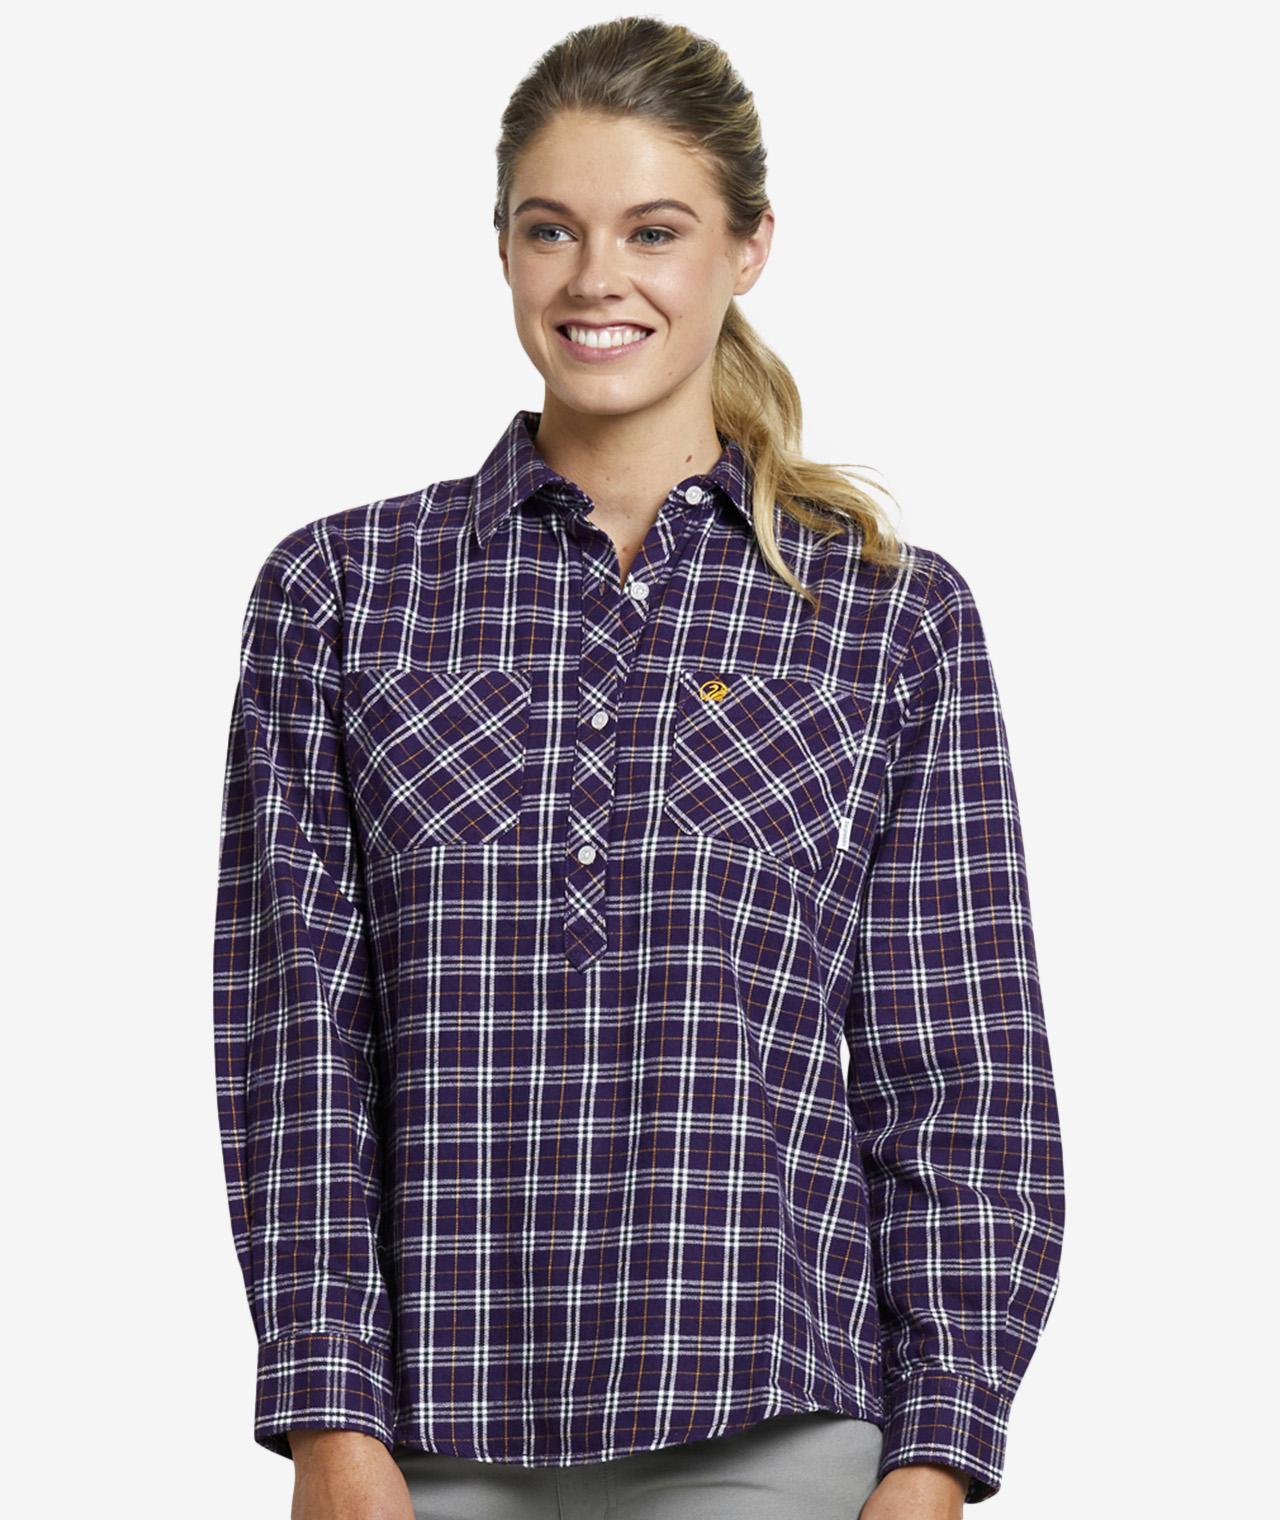 Swanndri Women's Barn Cotton Check Work Shirt in Plum/Ginger Check